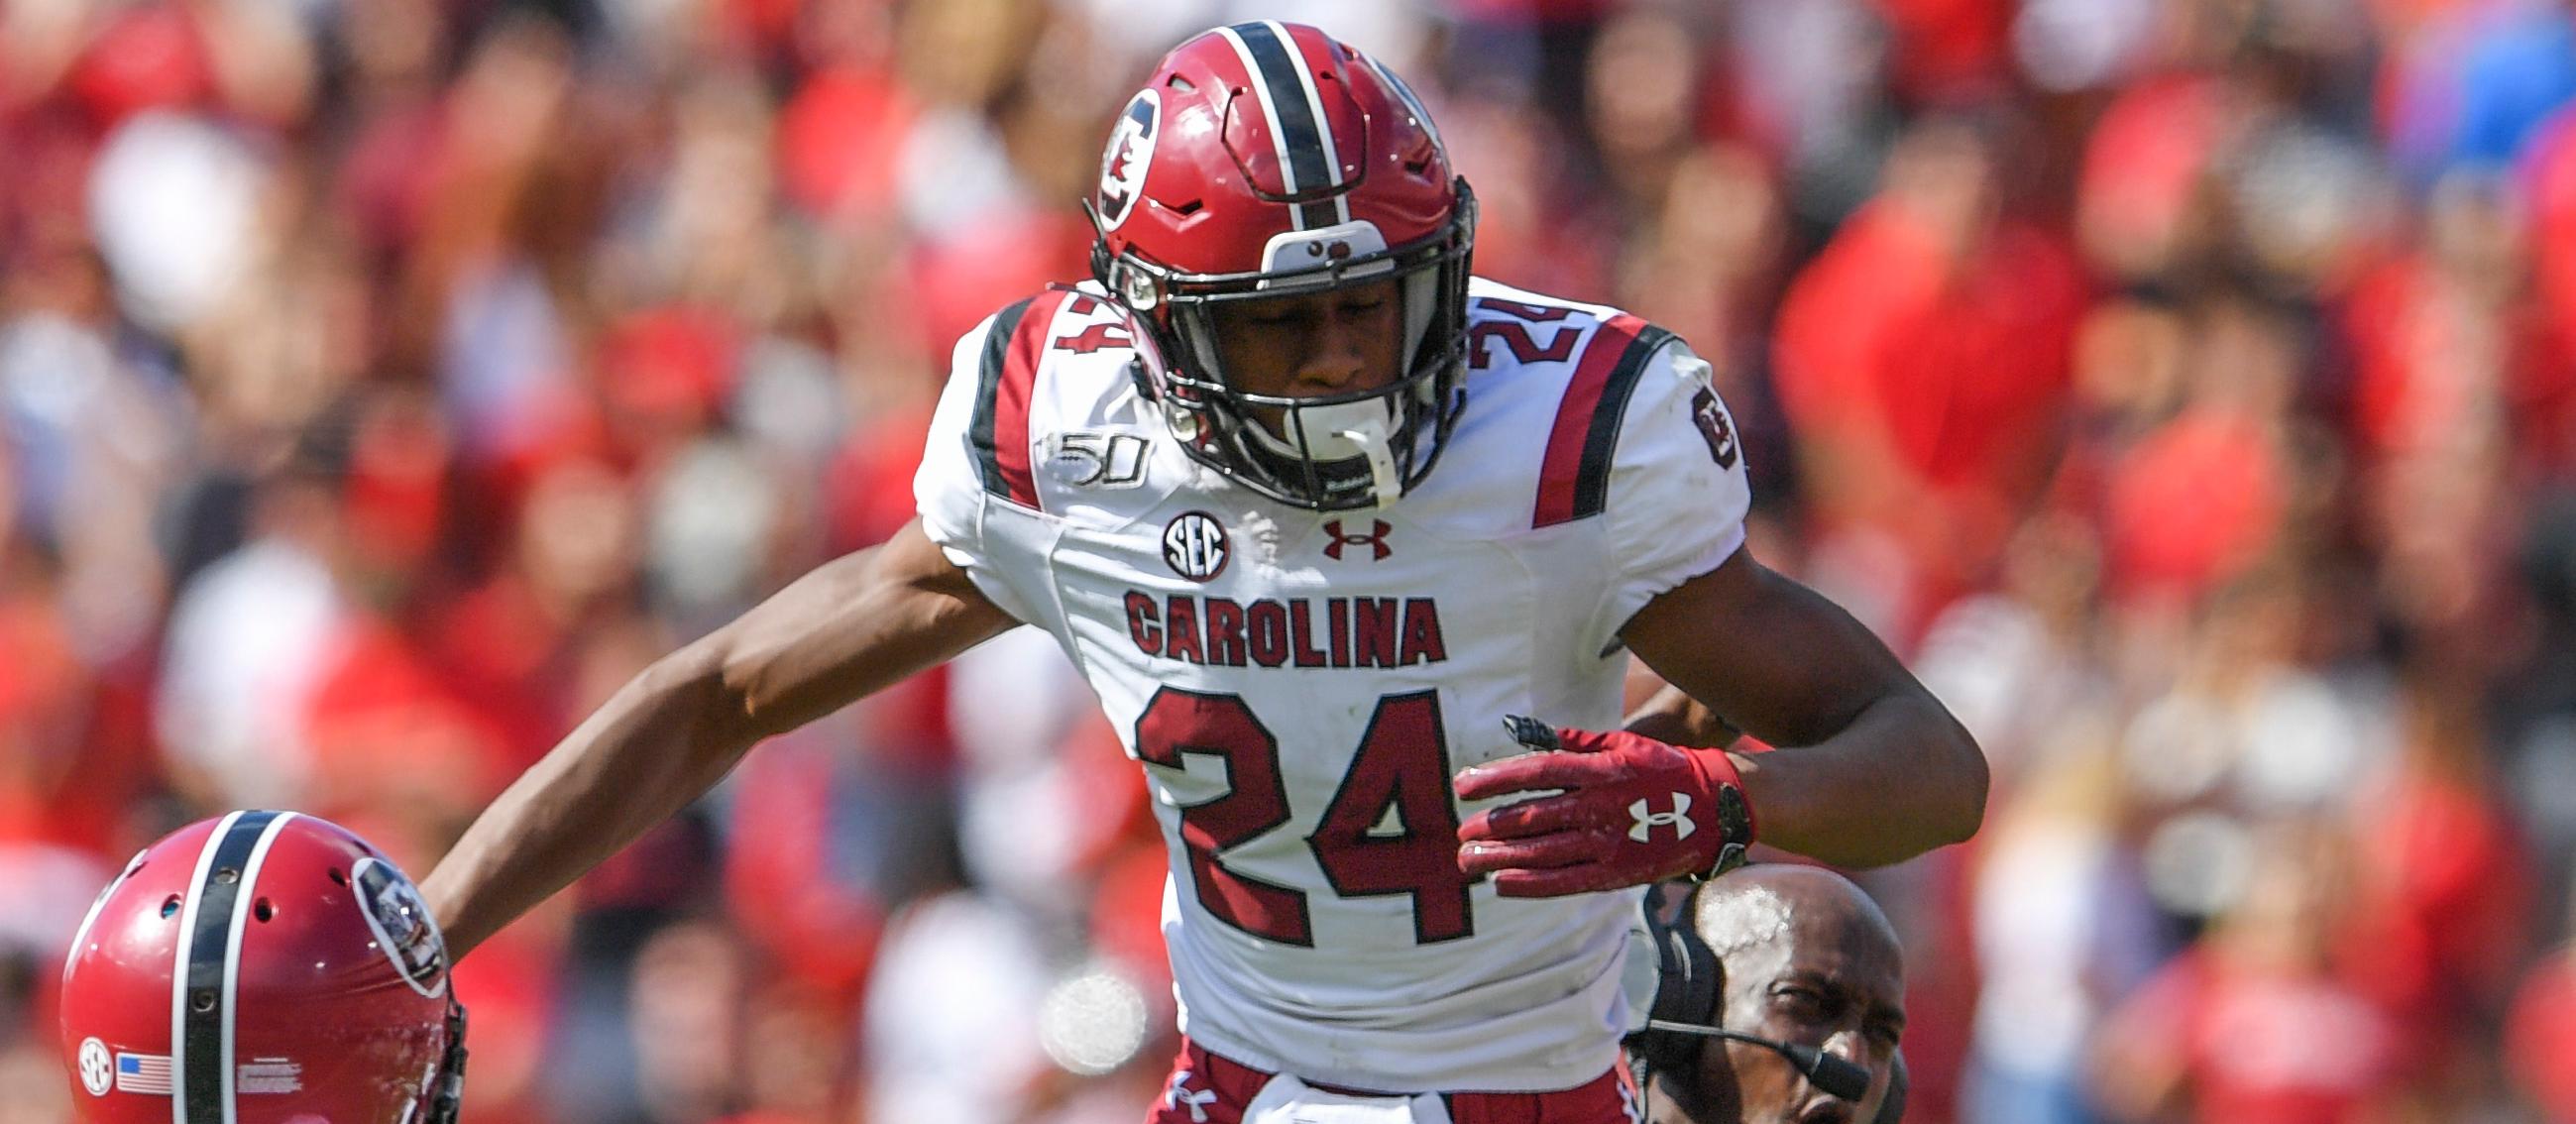 OFI: South Carolina Shakes Up Playoff Race